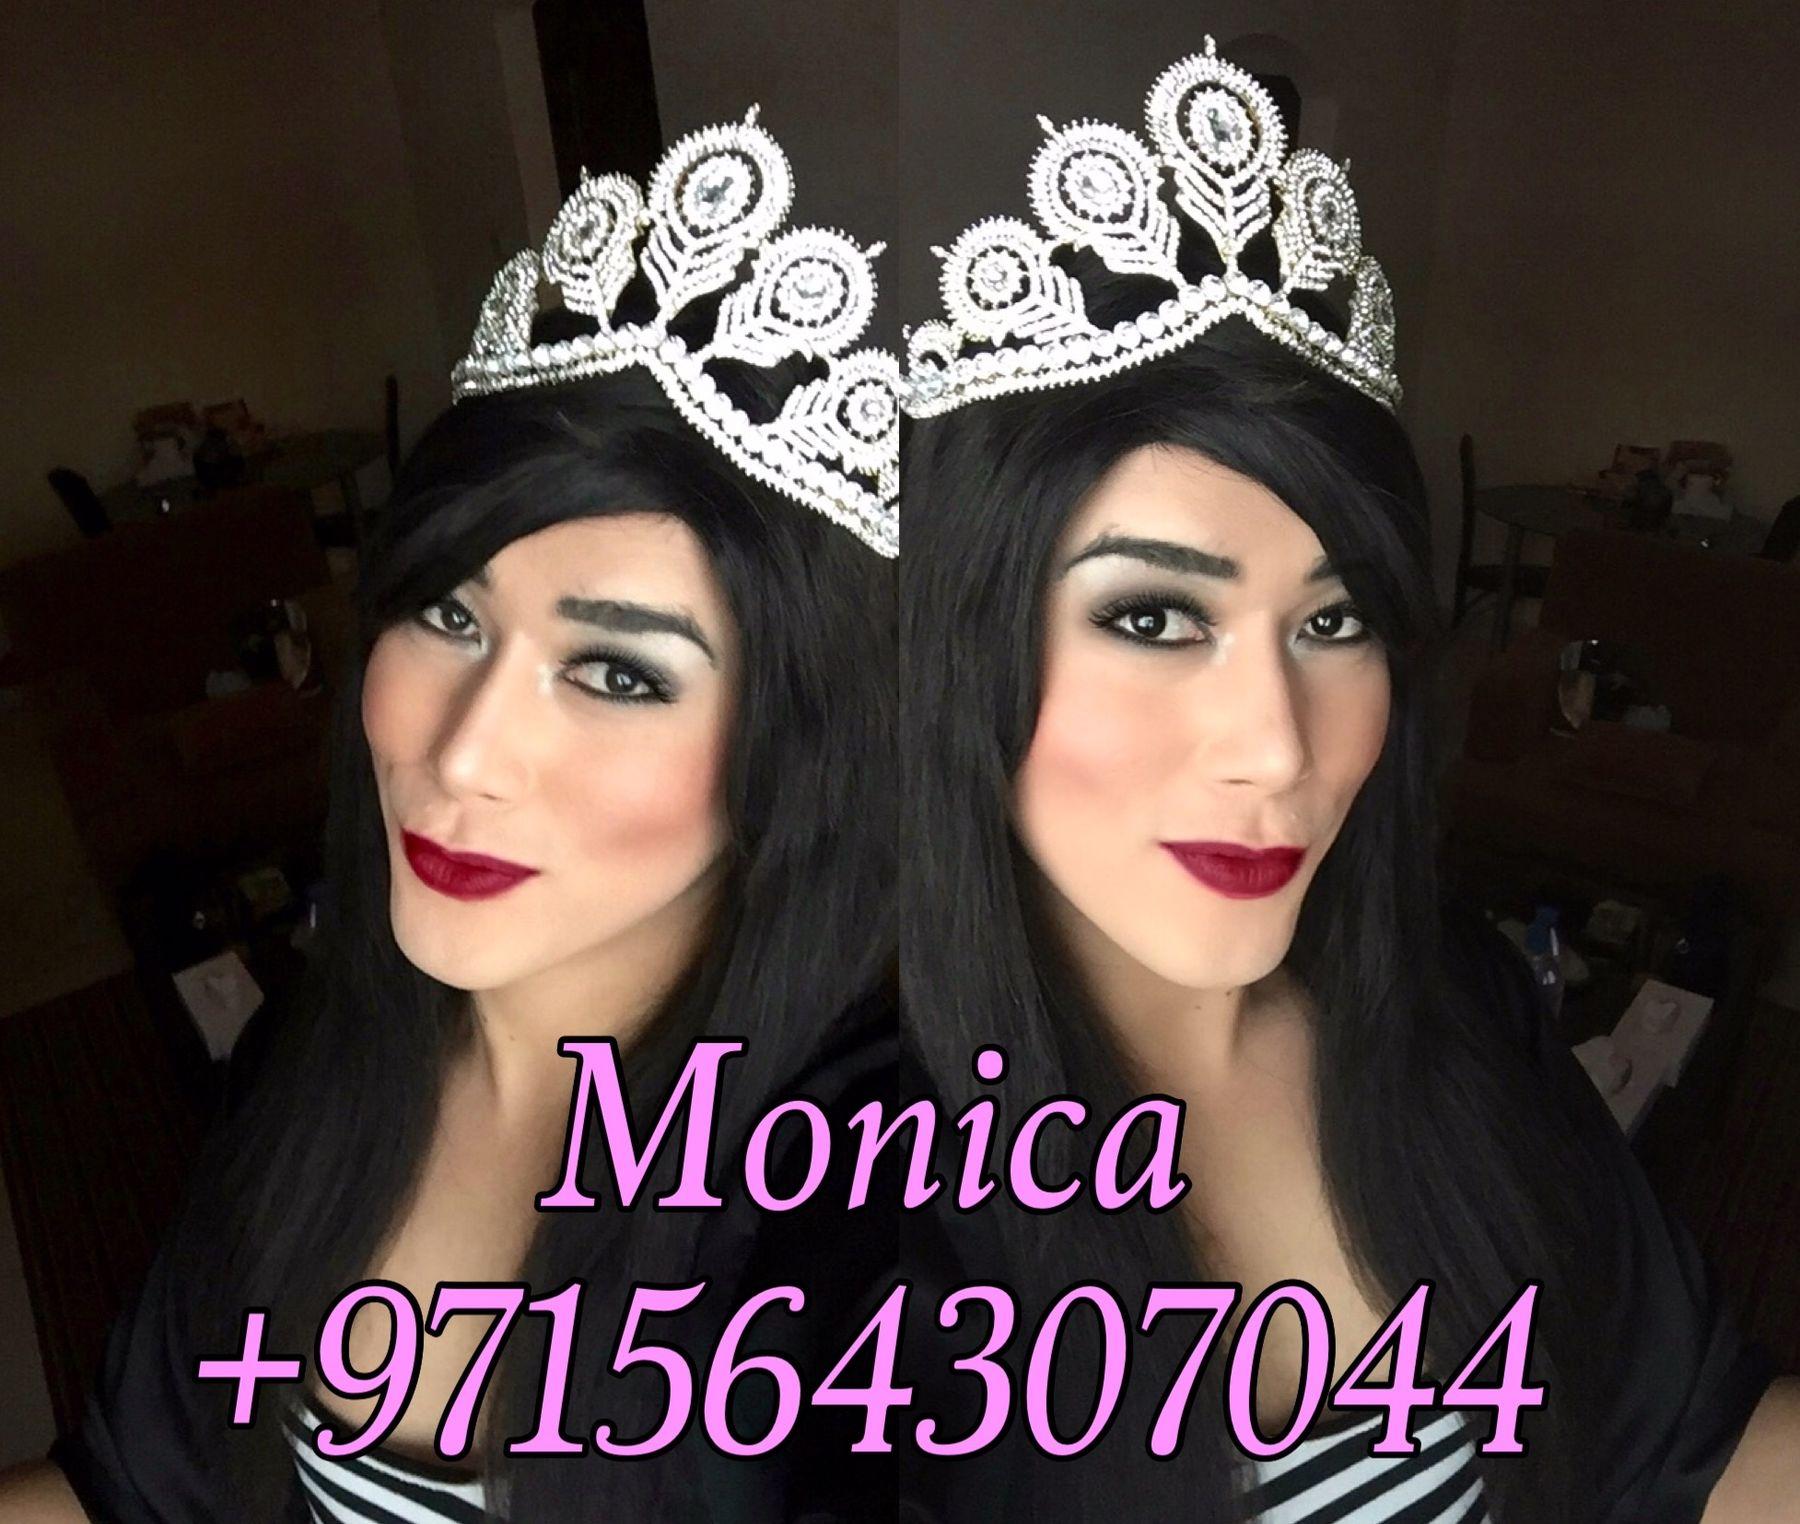 ts monica escort asian girl porn videos